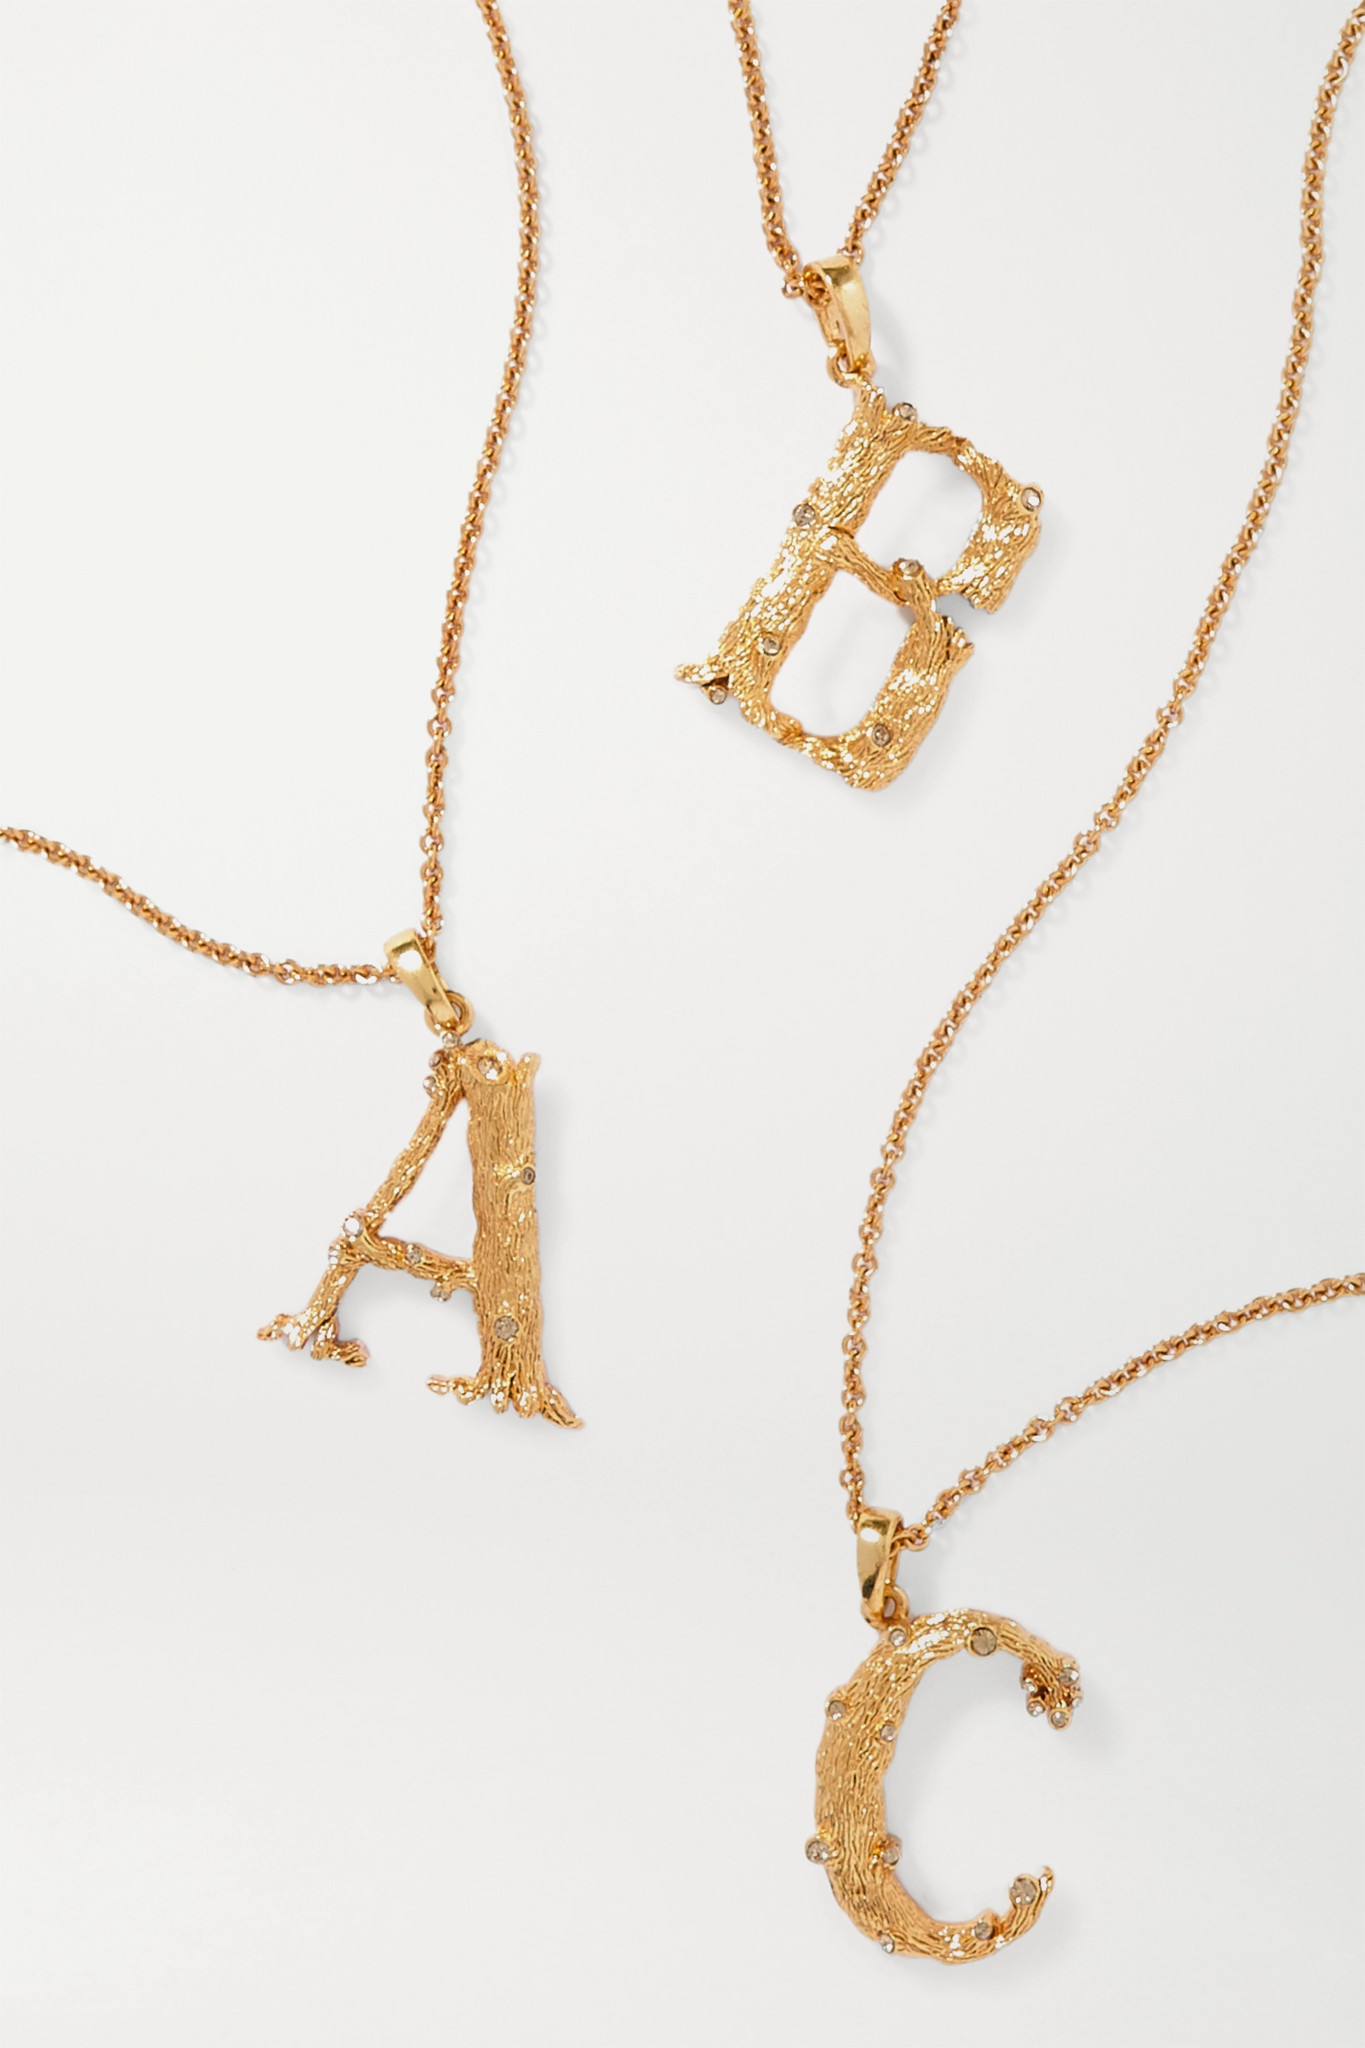 OSCAR DE LA RENTA - Letter 水晶镀金项链 - 金色 - D